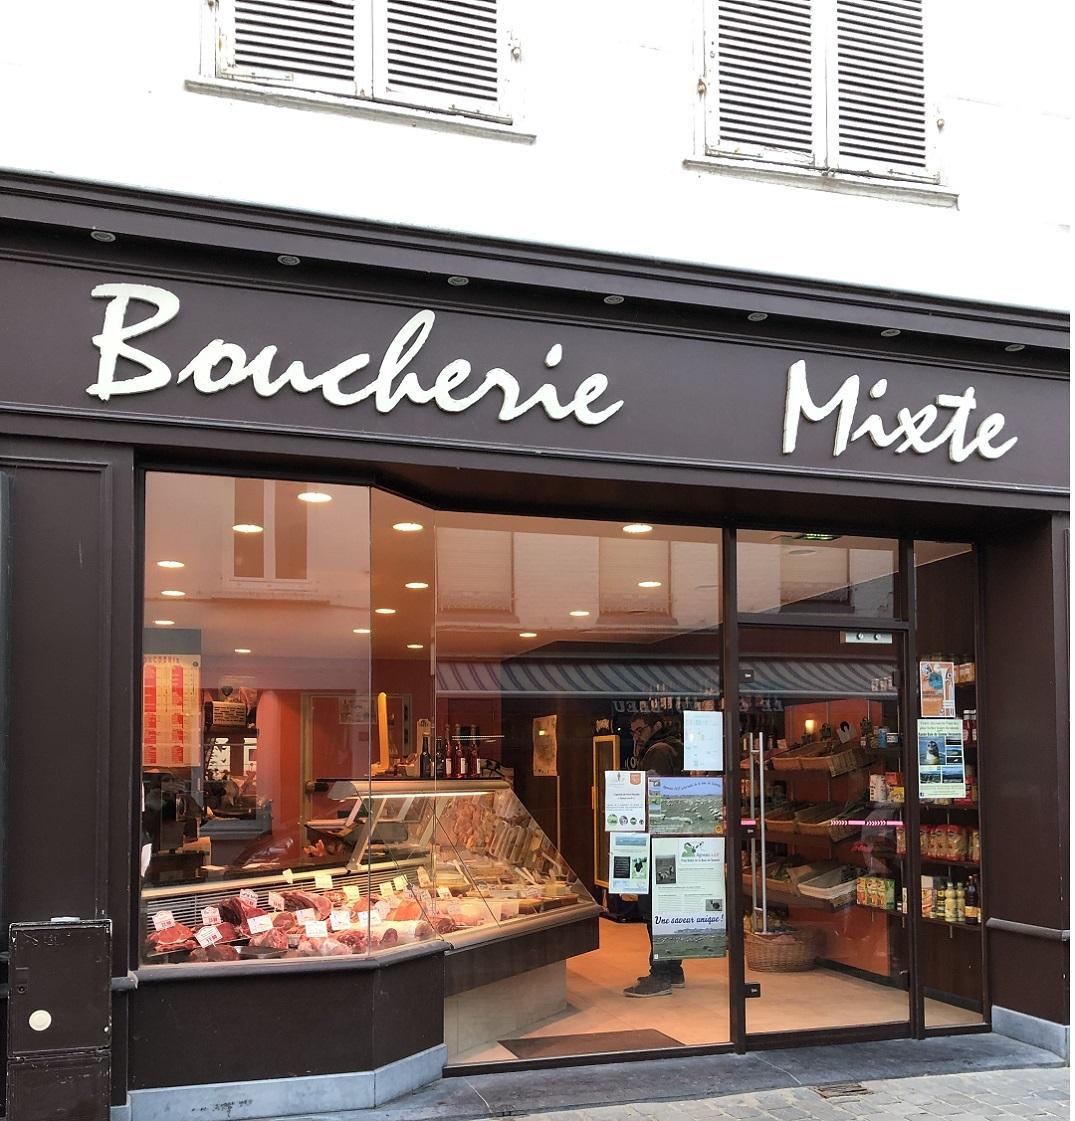 OtBaiedeSomme-Boucherie-Mixte